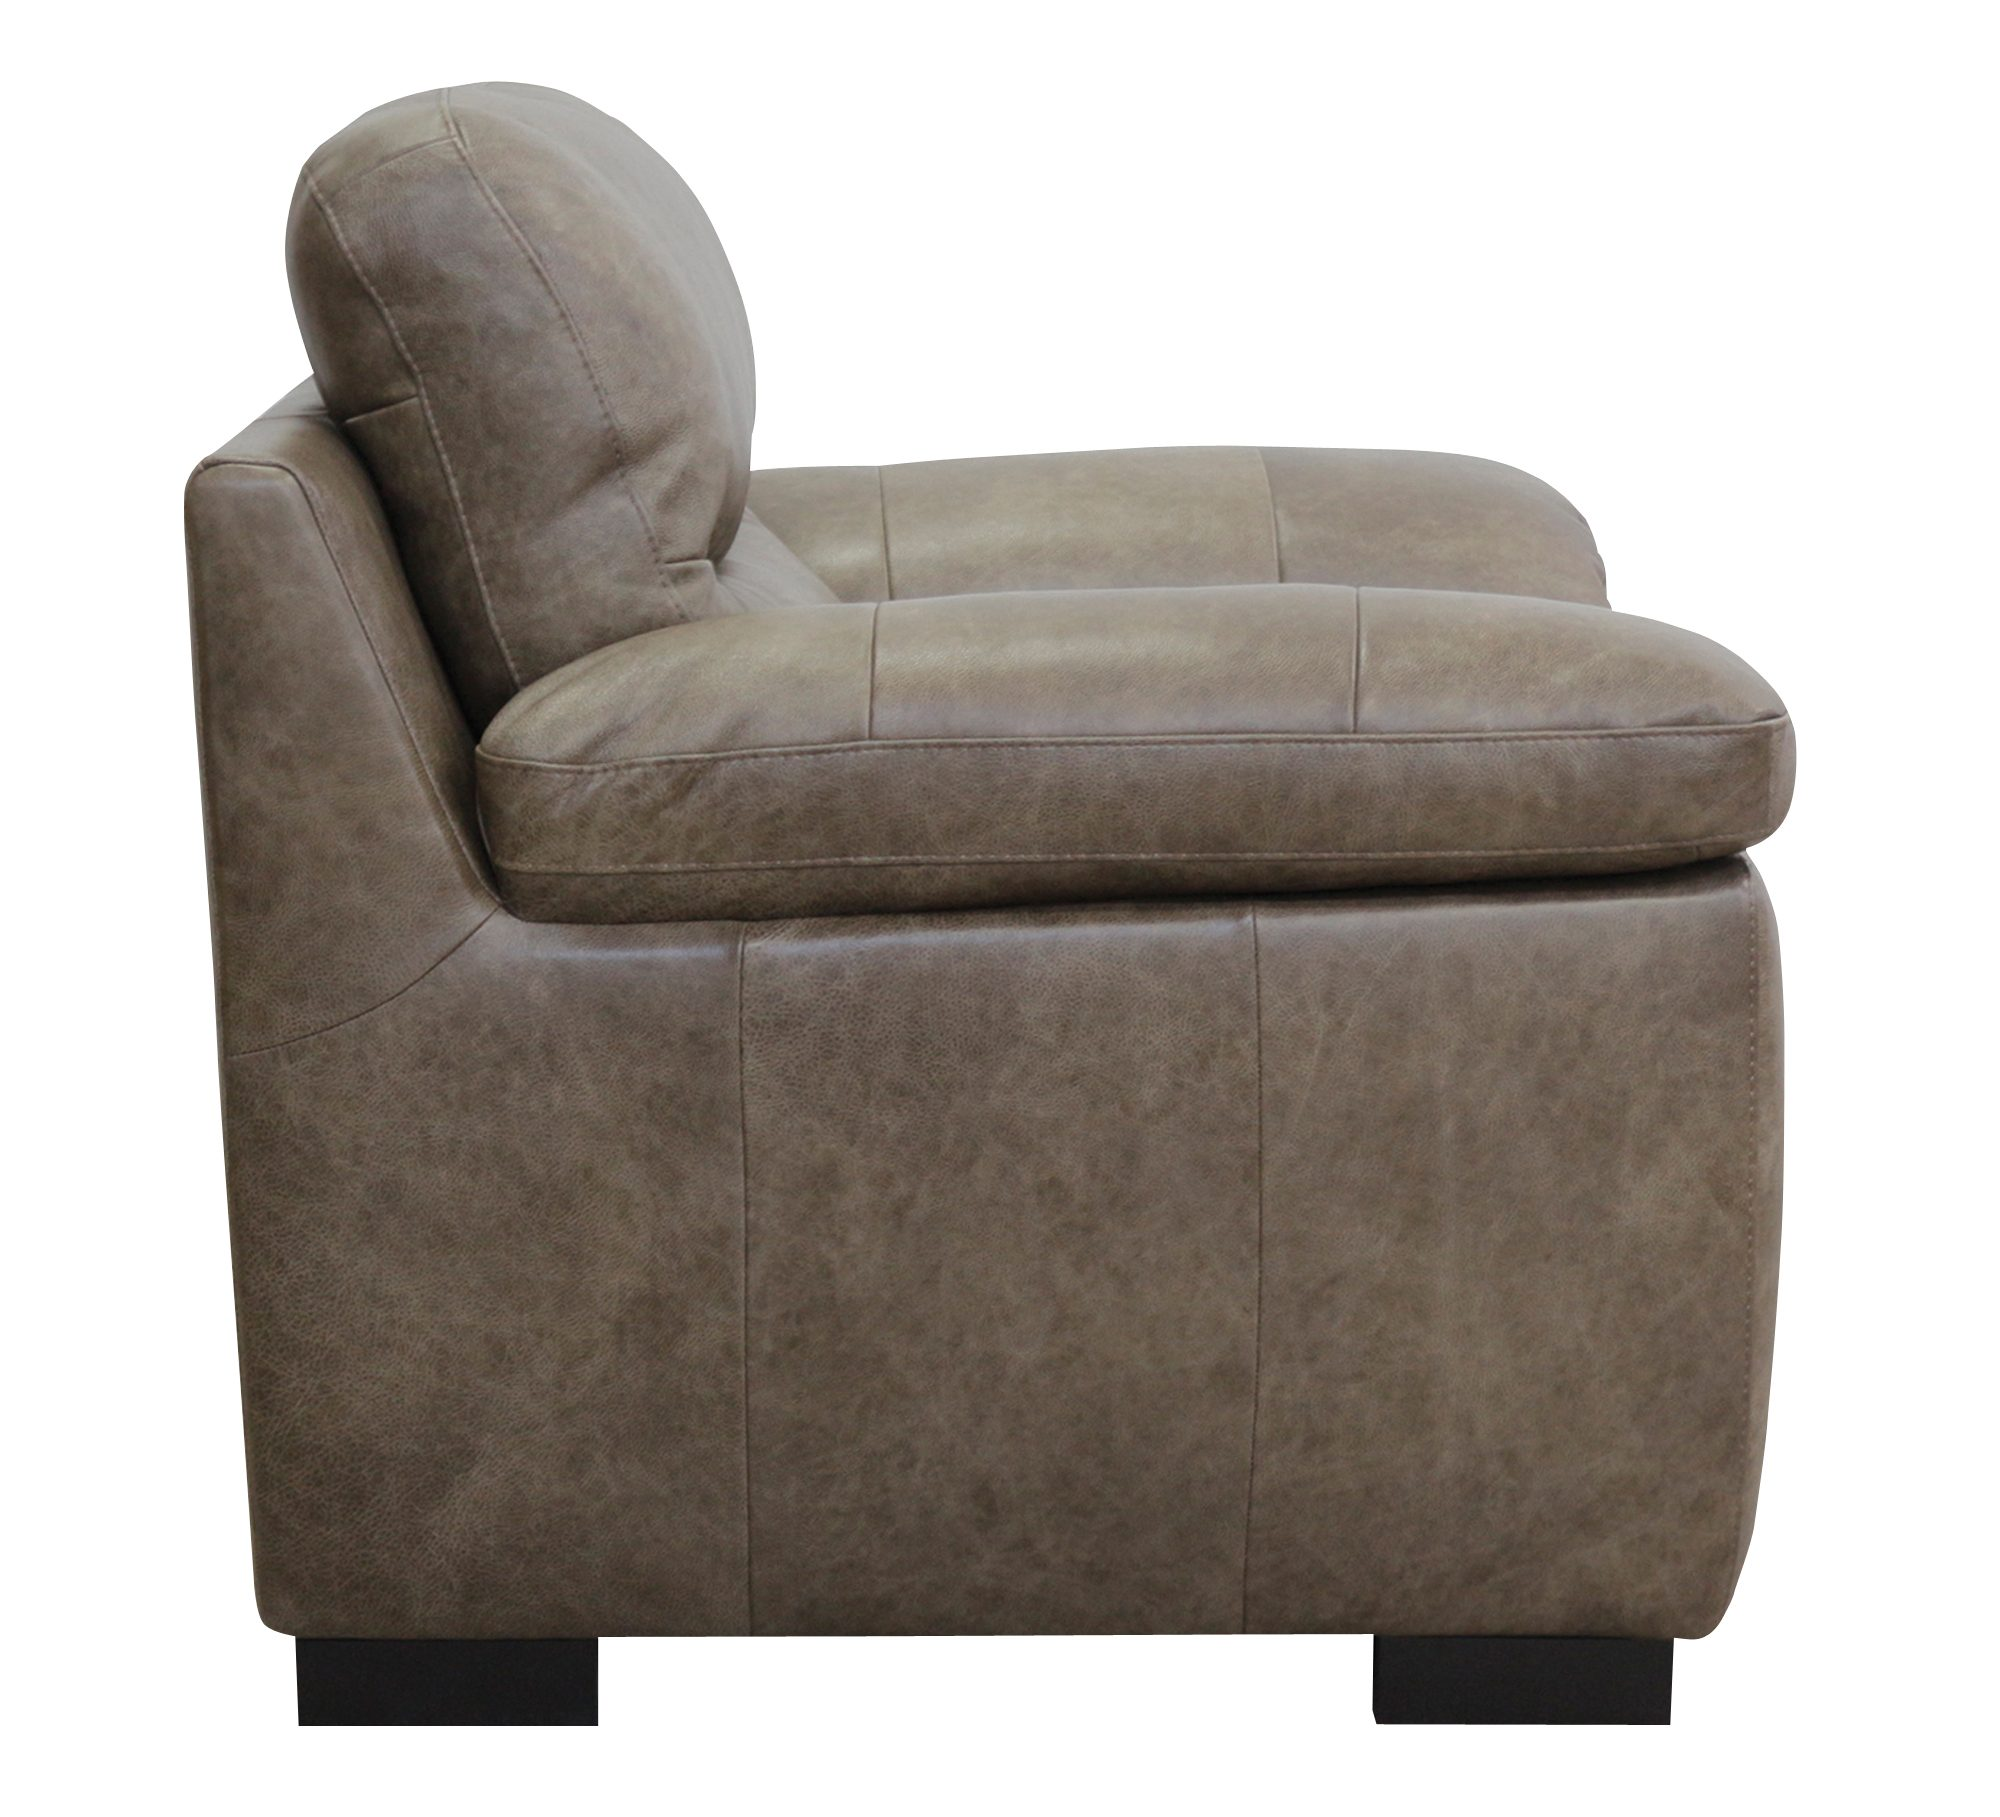 Tatum Collection Luke Leather Furniture